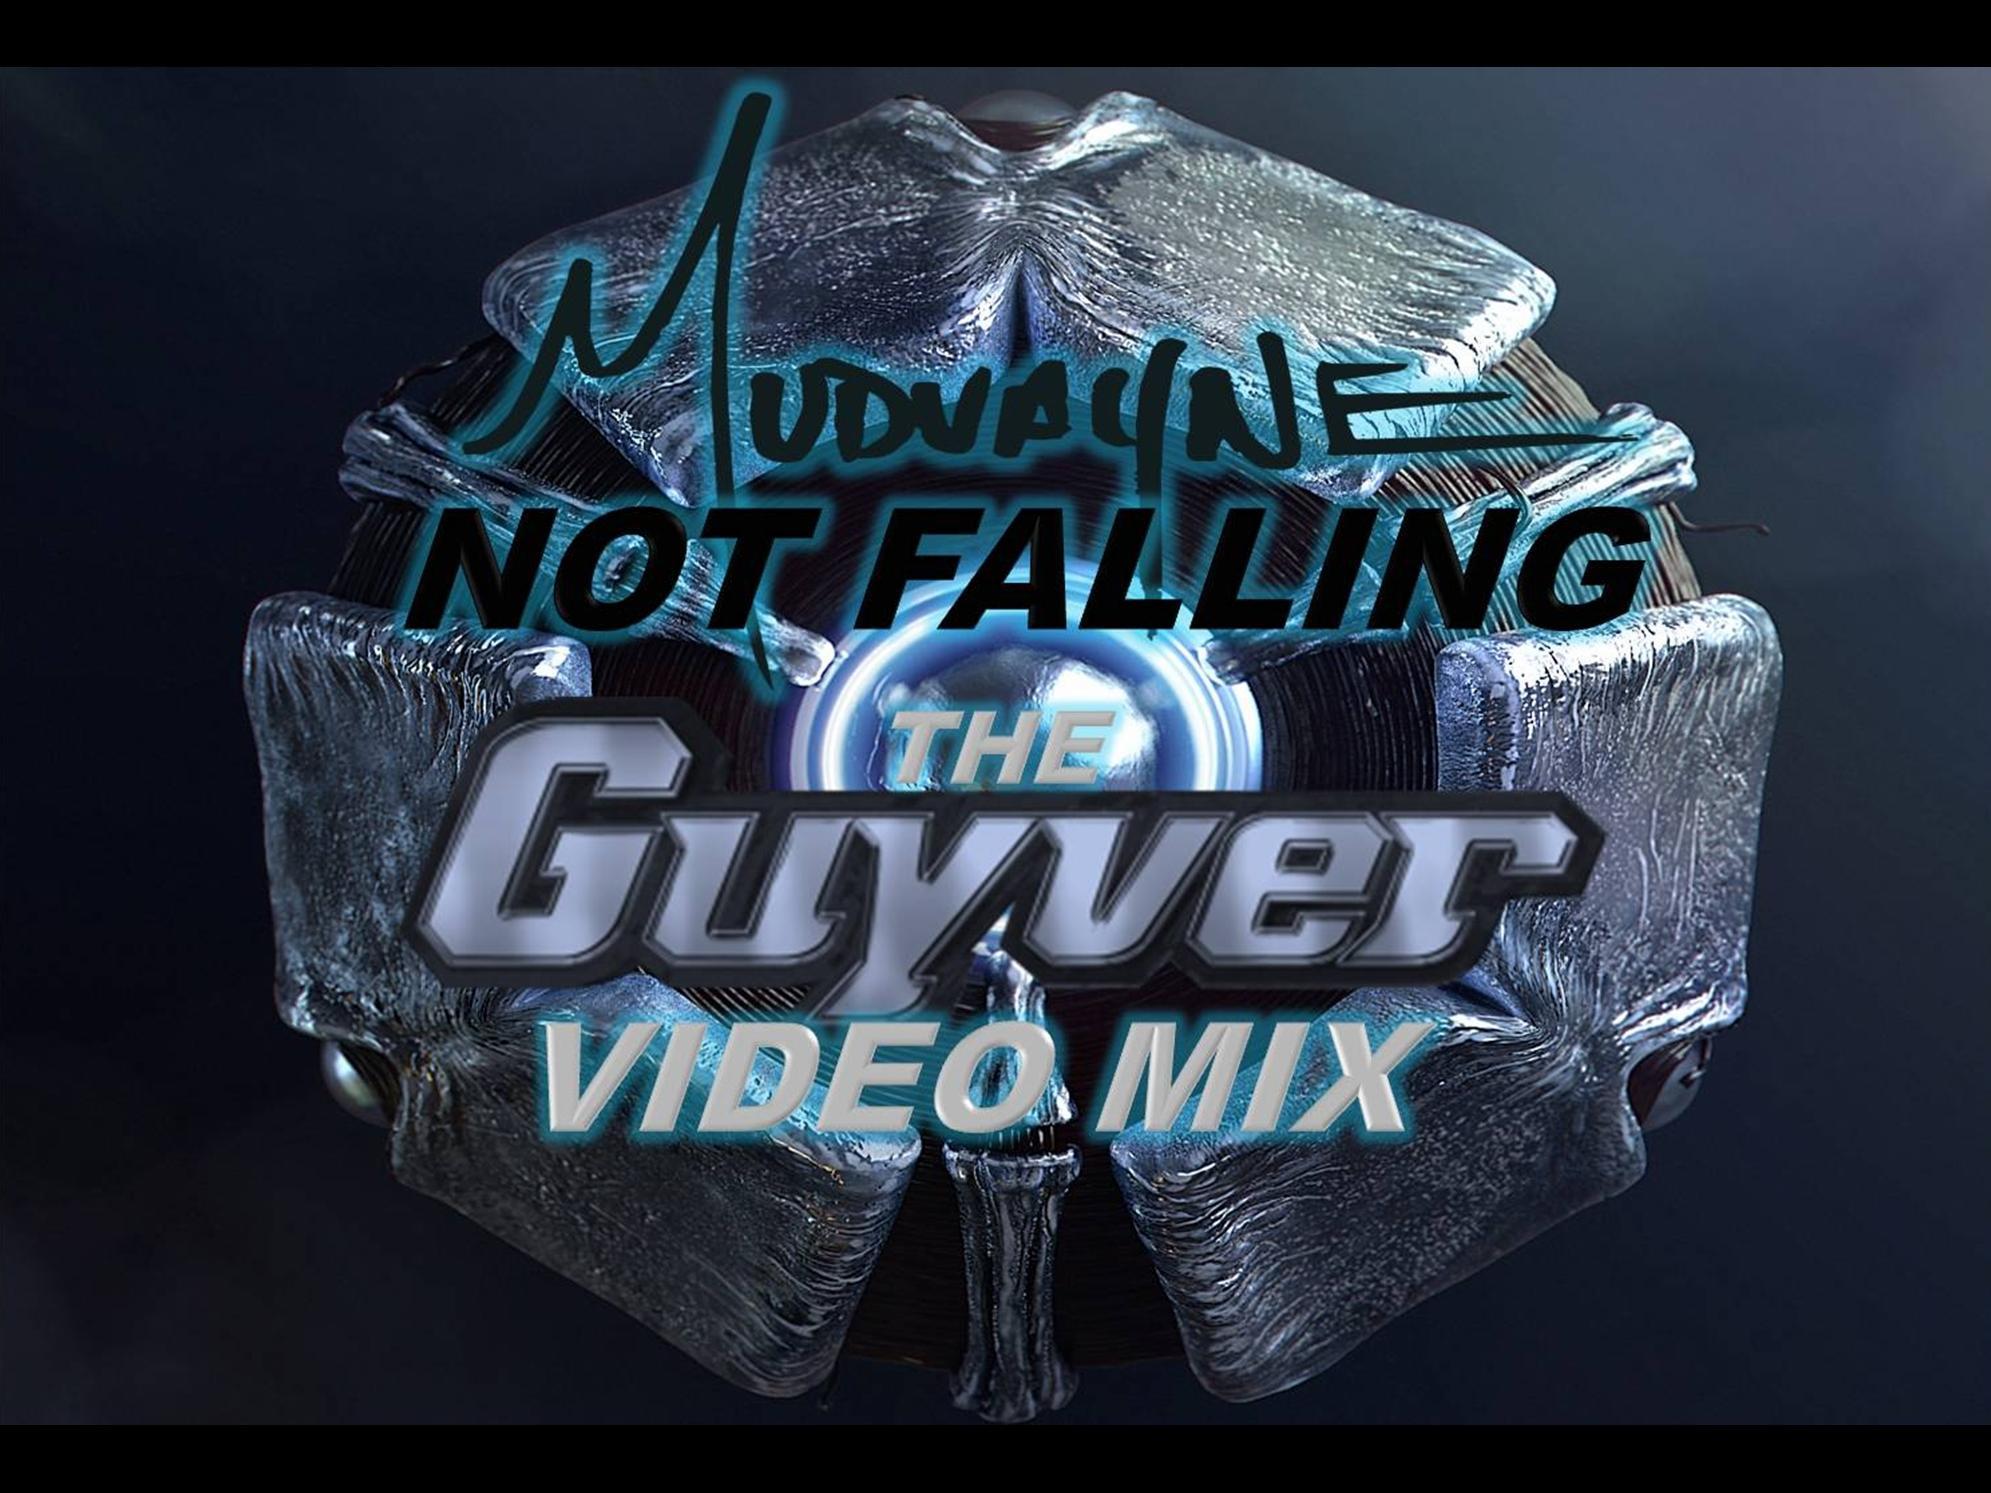 Mudvayne- Not Falling (The Guyver Video Mix)